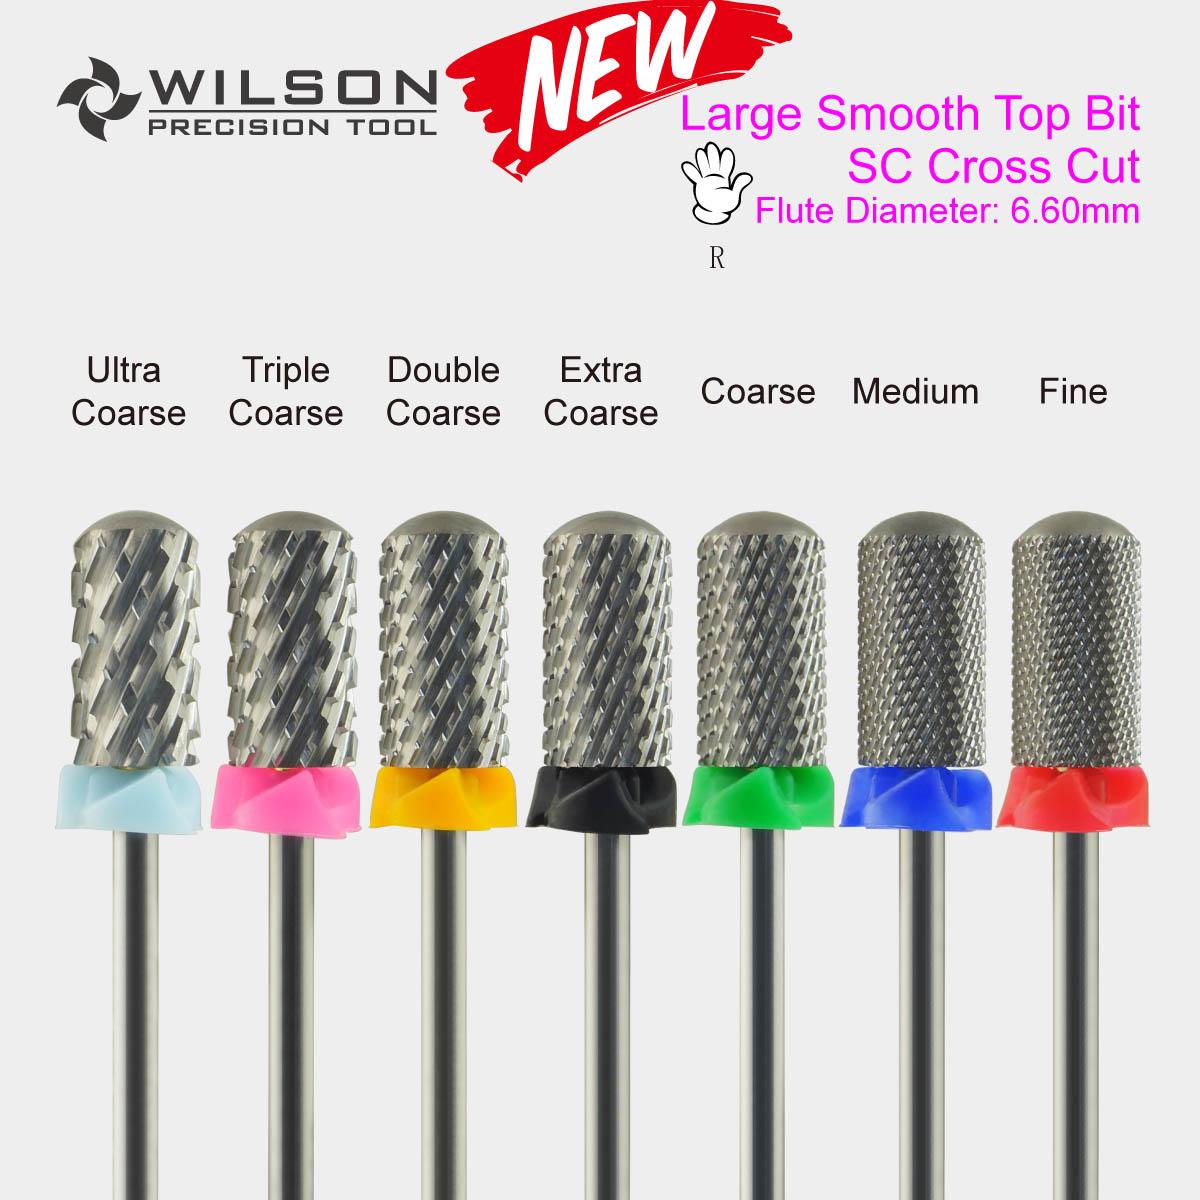 Large Smooth Top Bit[SC Cross Cut] - Carbide Nail Bits